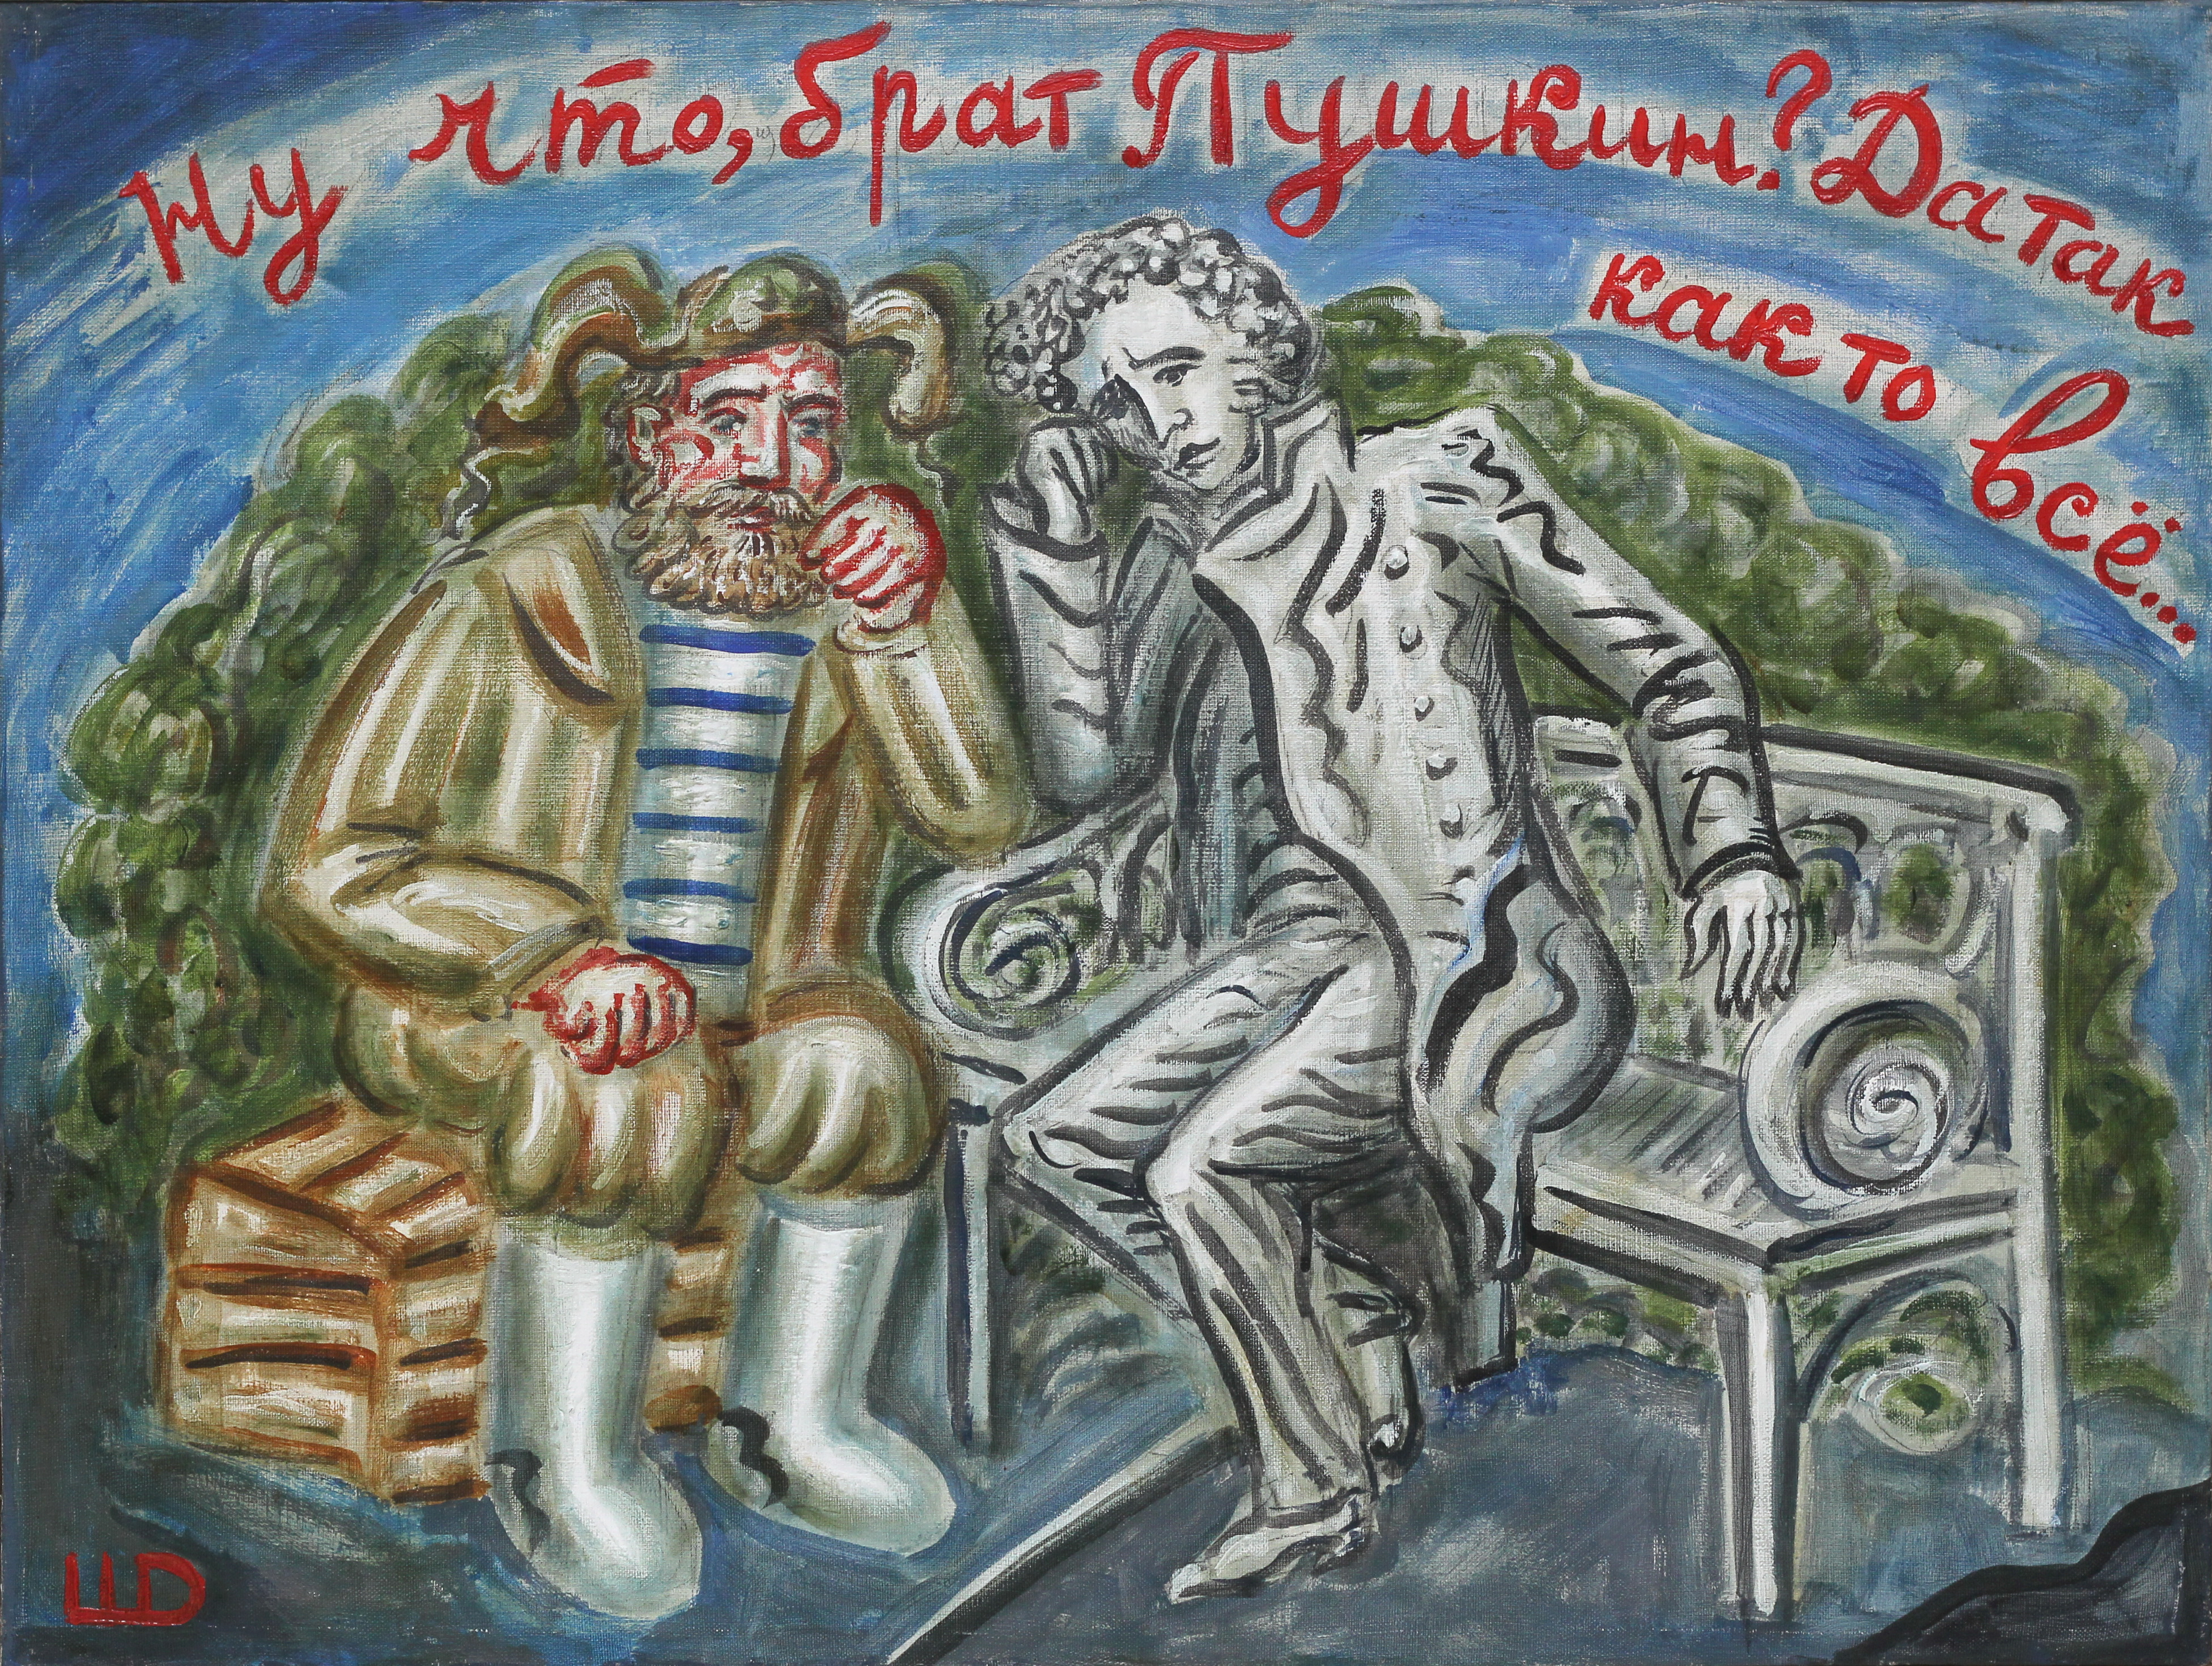 Dmitrij-SHagin-Nu-chto-Brat-Pushkin-Da-tak-kak-to-vse...-60h80-1996.jpg